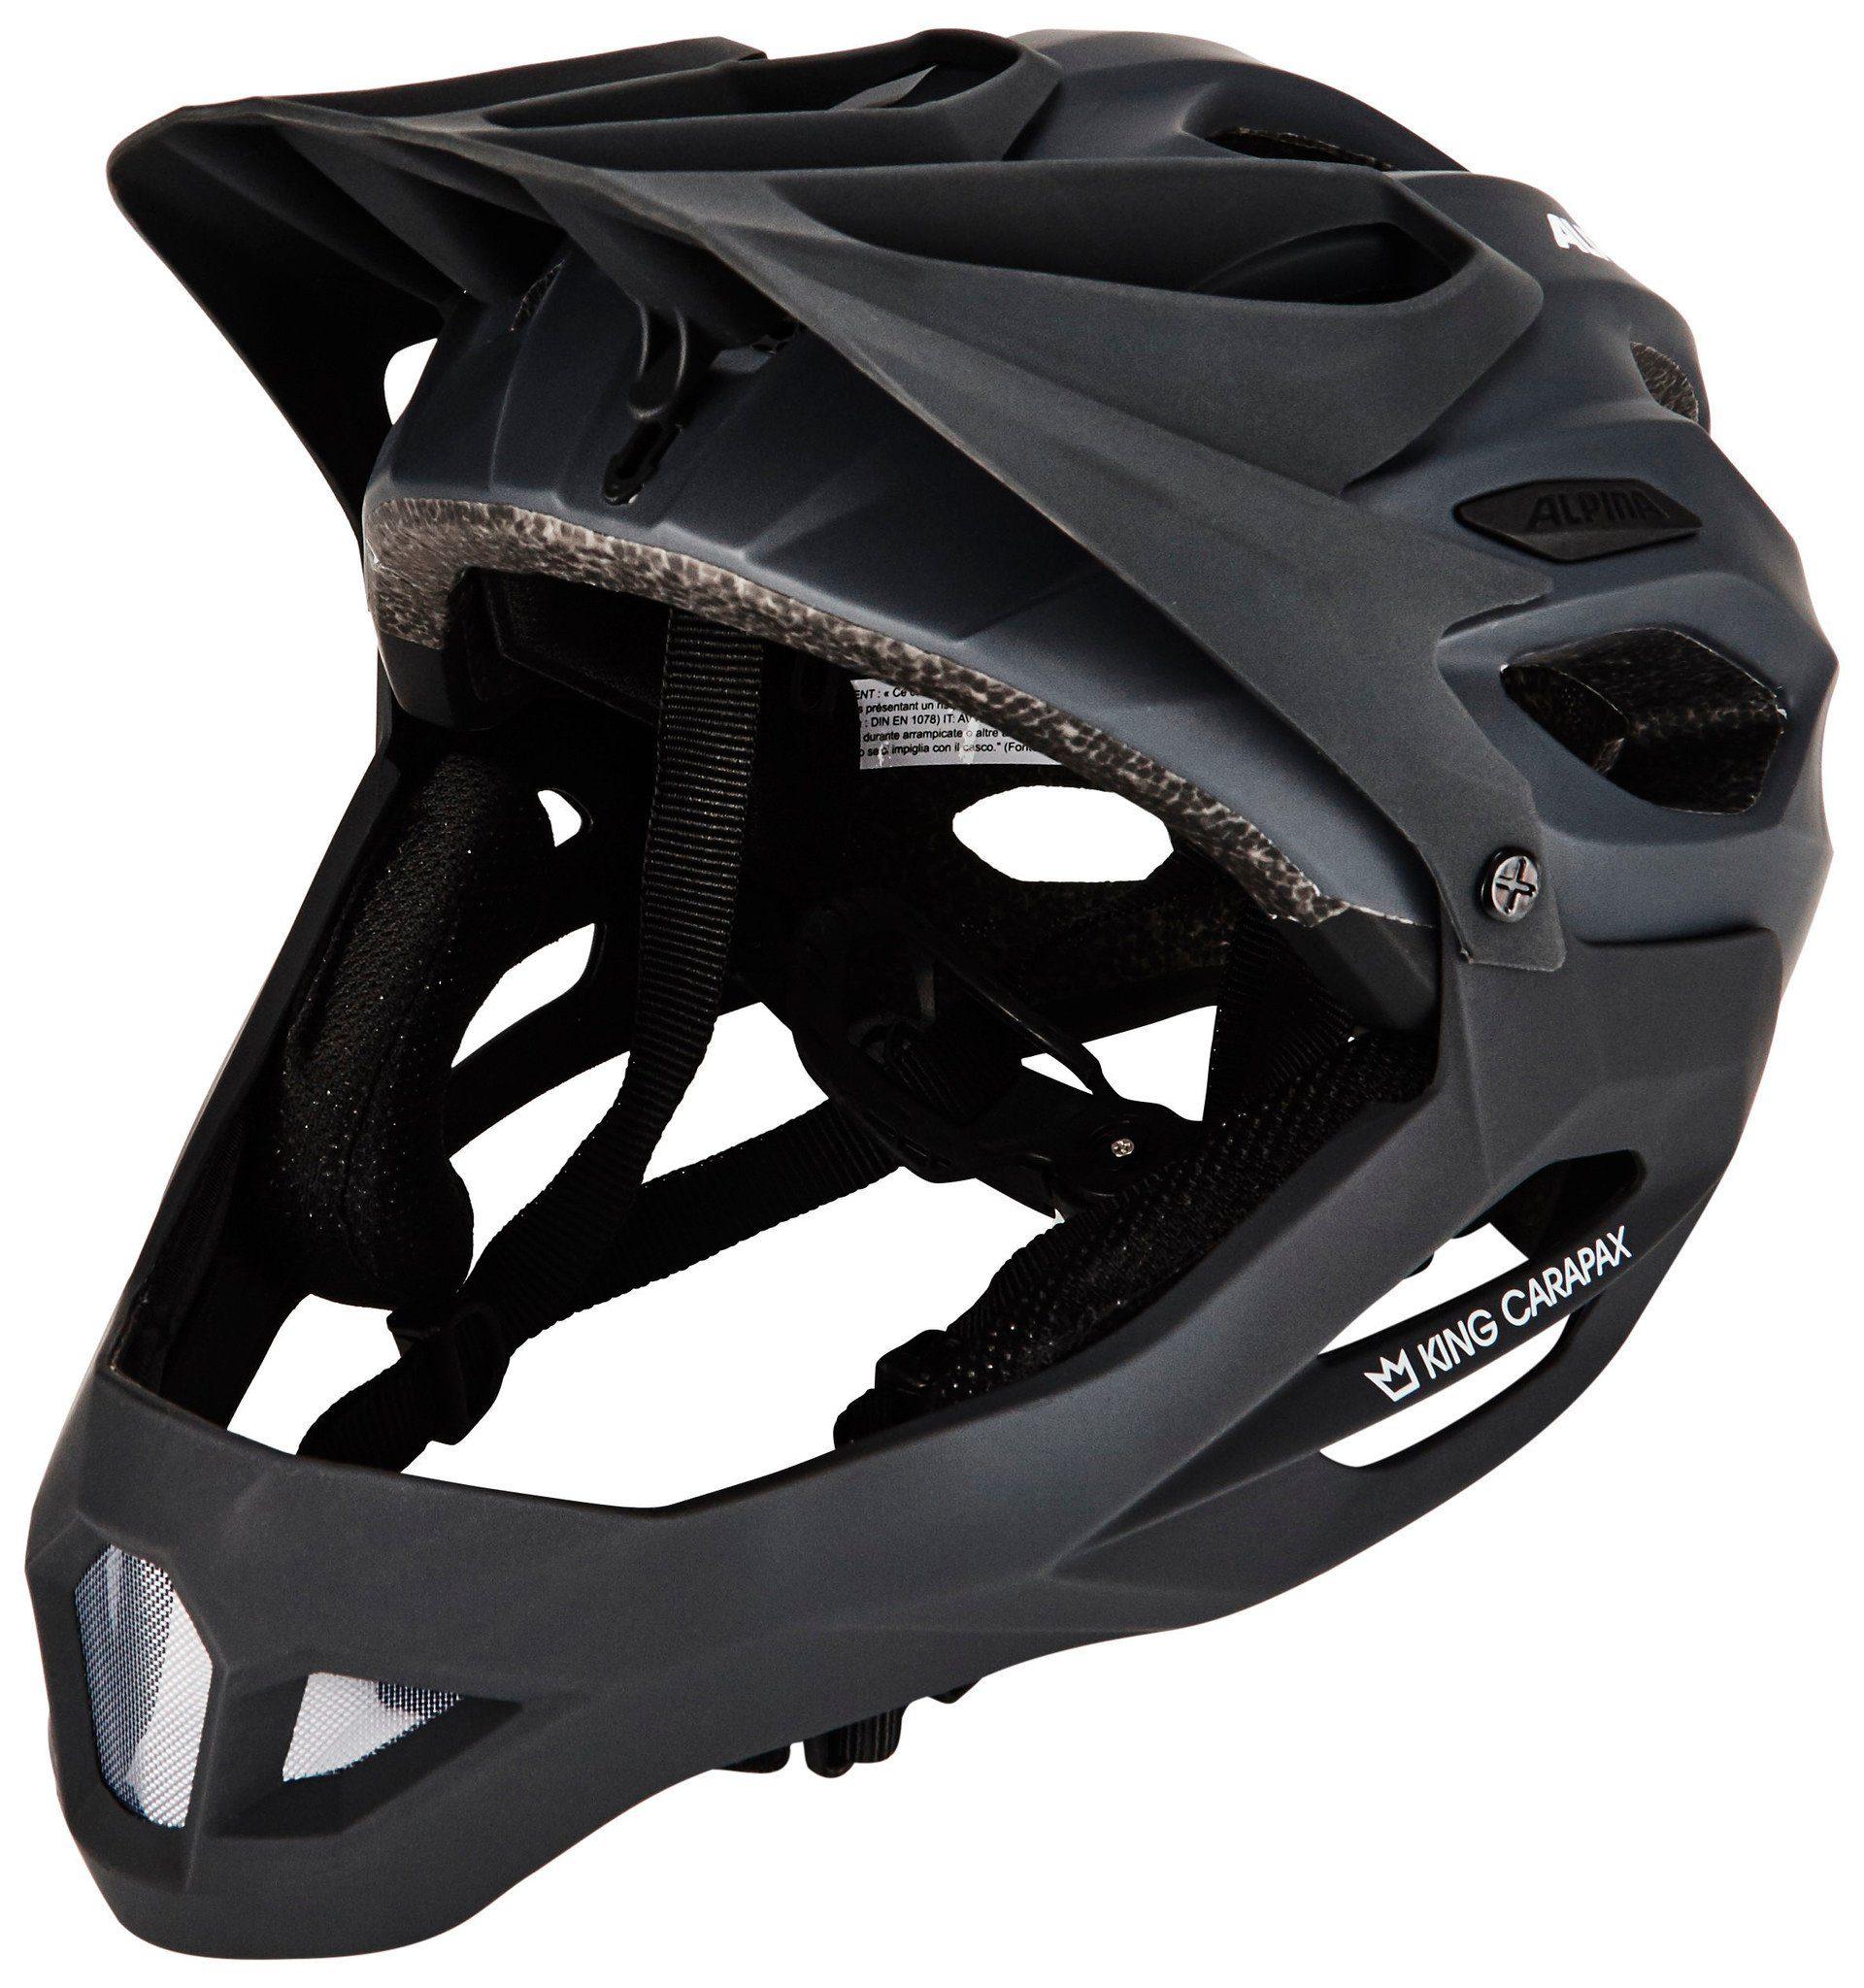 Alpina Sports Fahrradhelm »King Carapax Fullface Helmet«